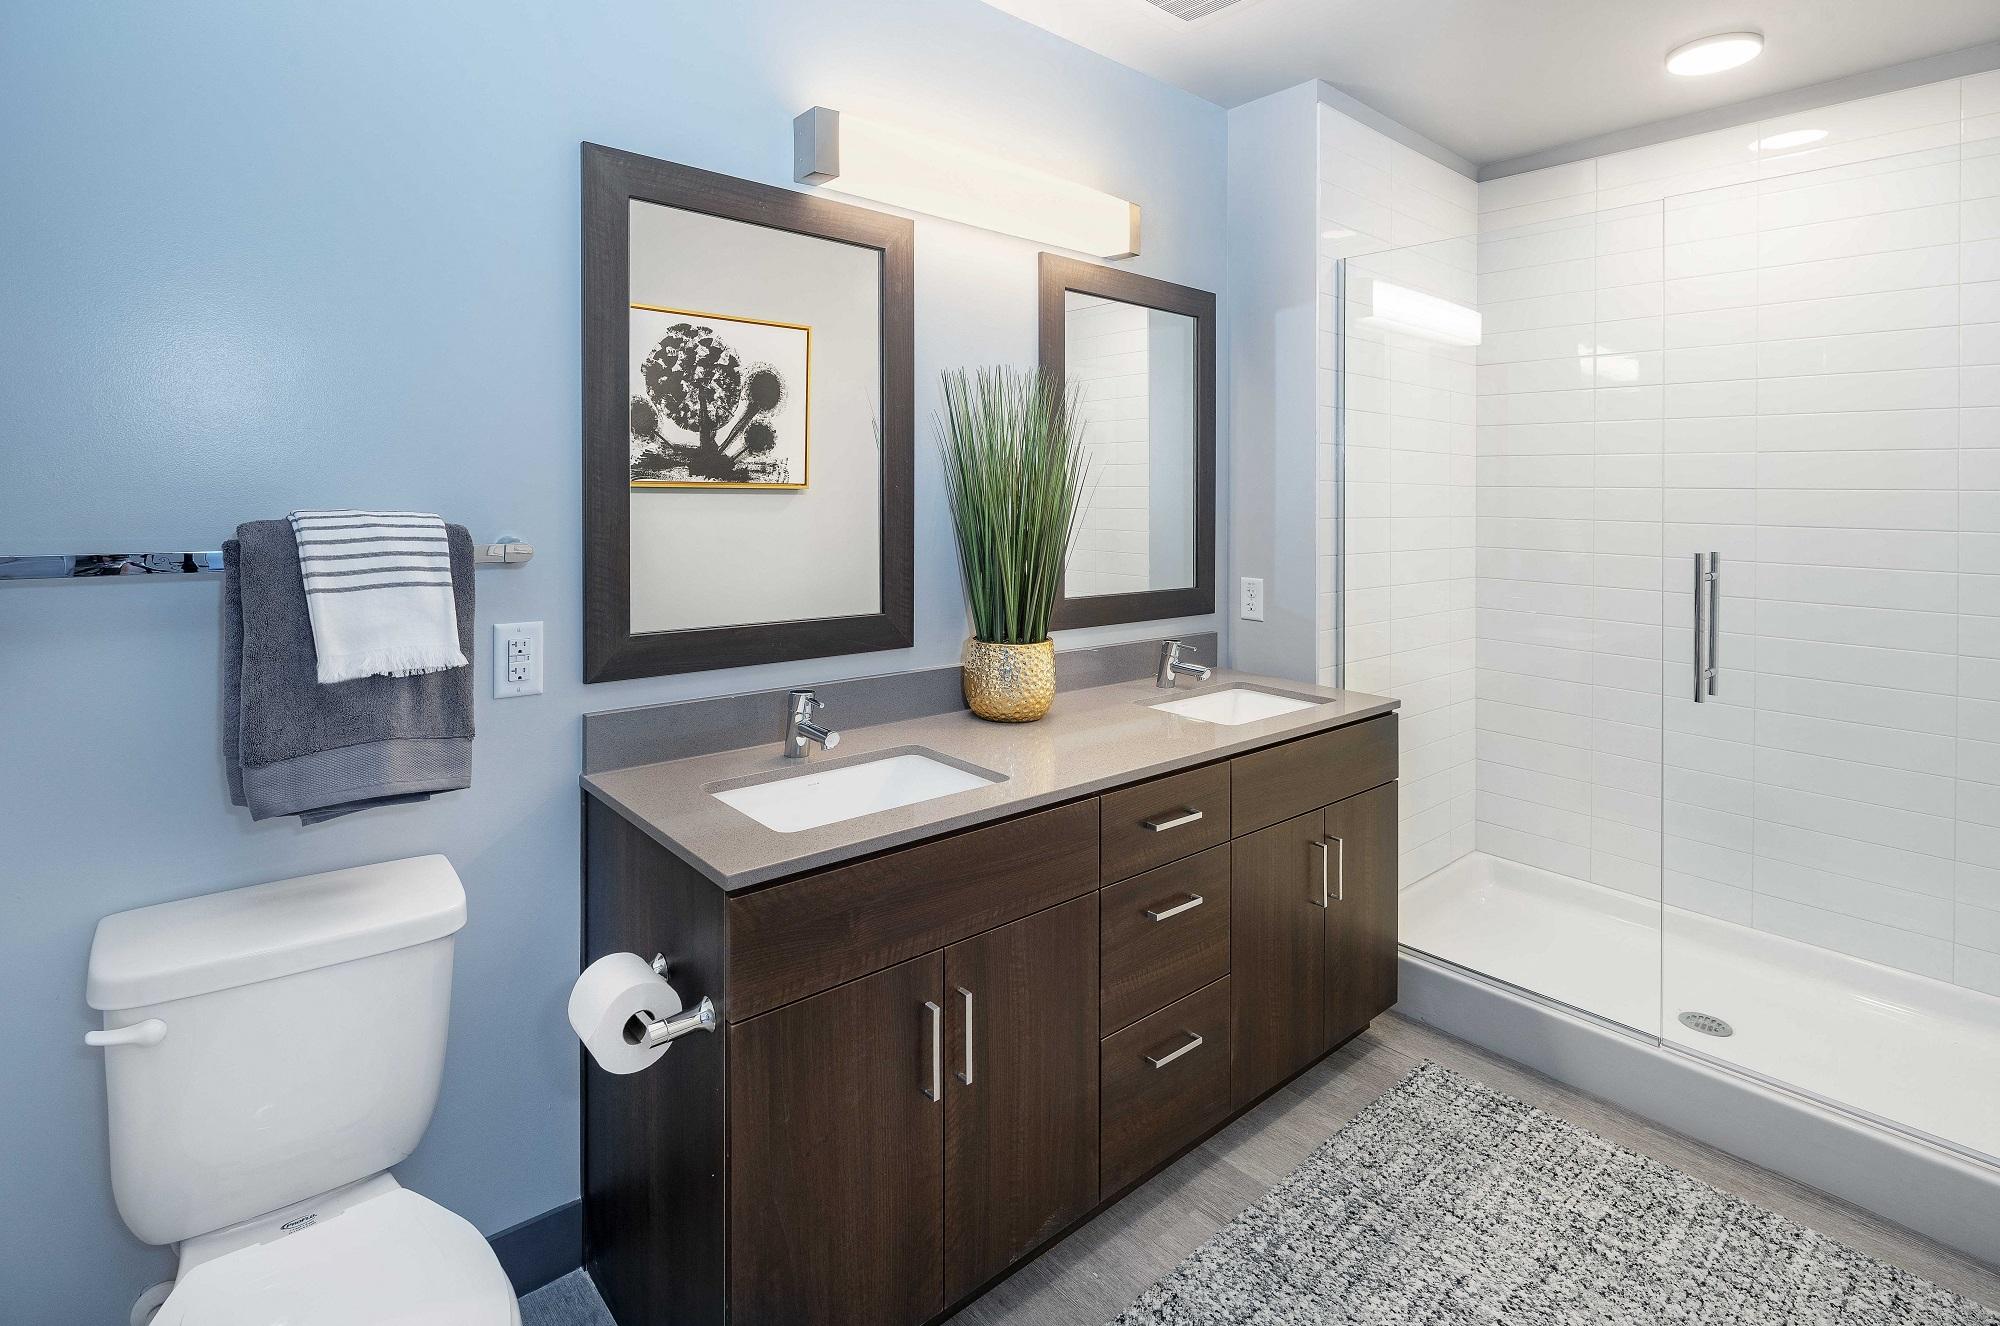 The Stewart bathroom